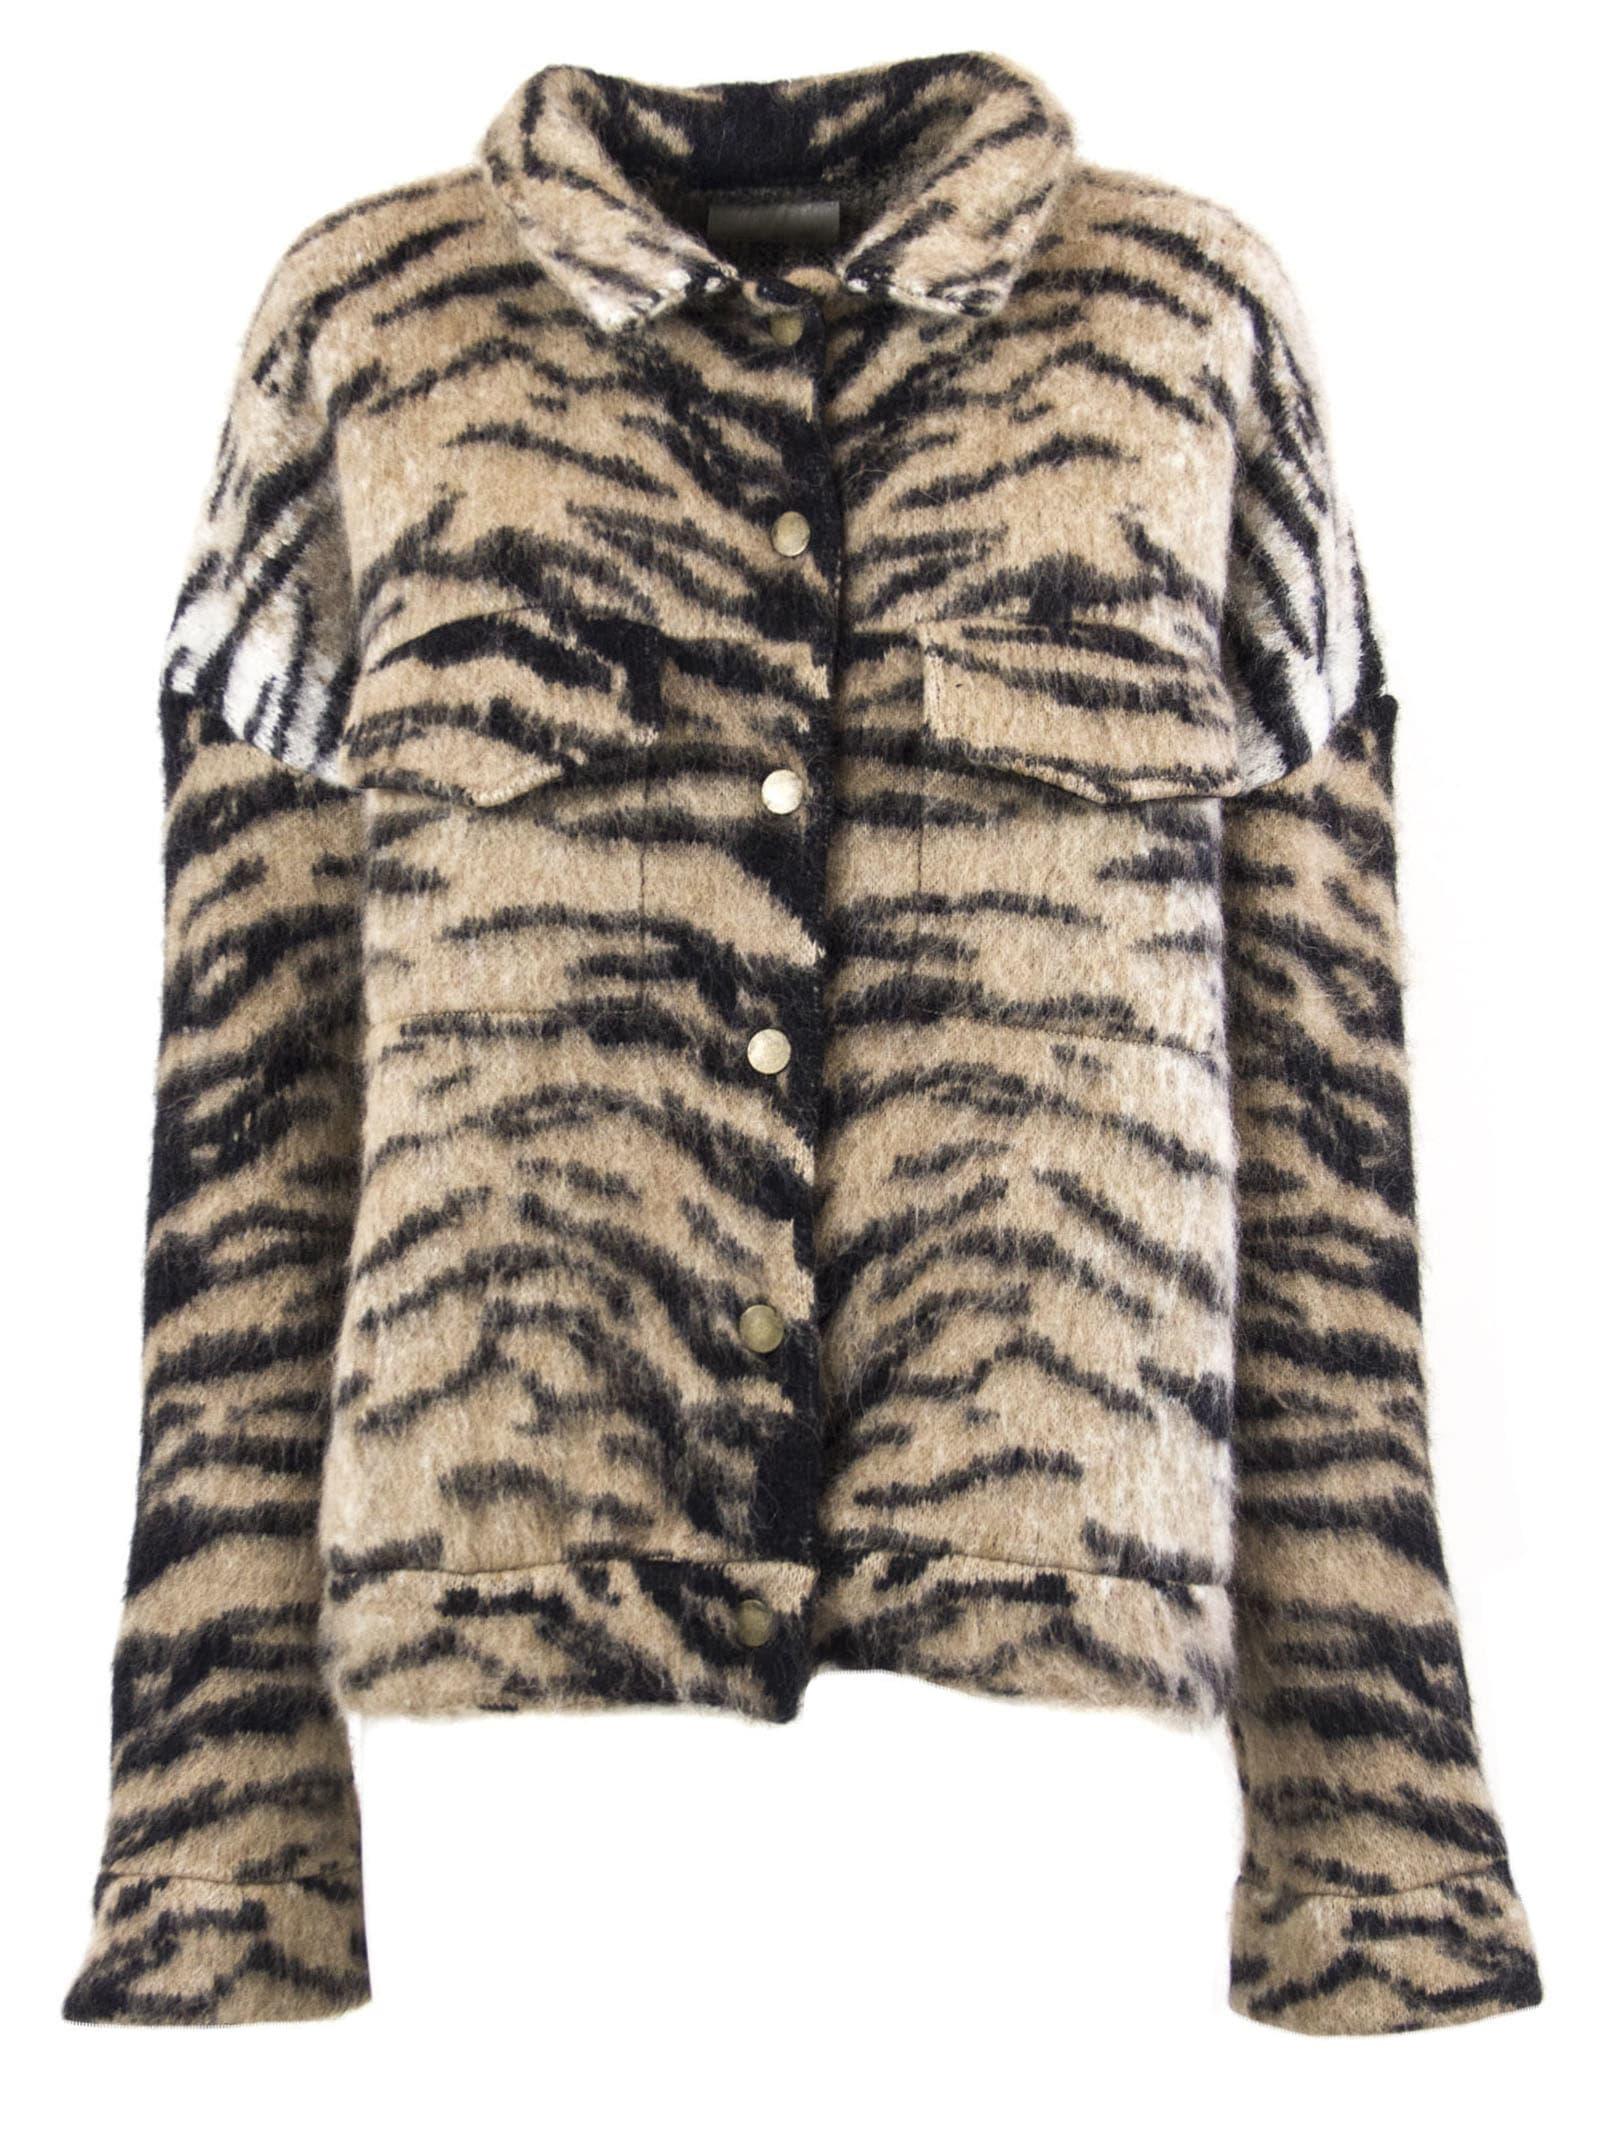 Laneus Beige And Black Tiger Pattern Jacket